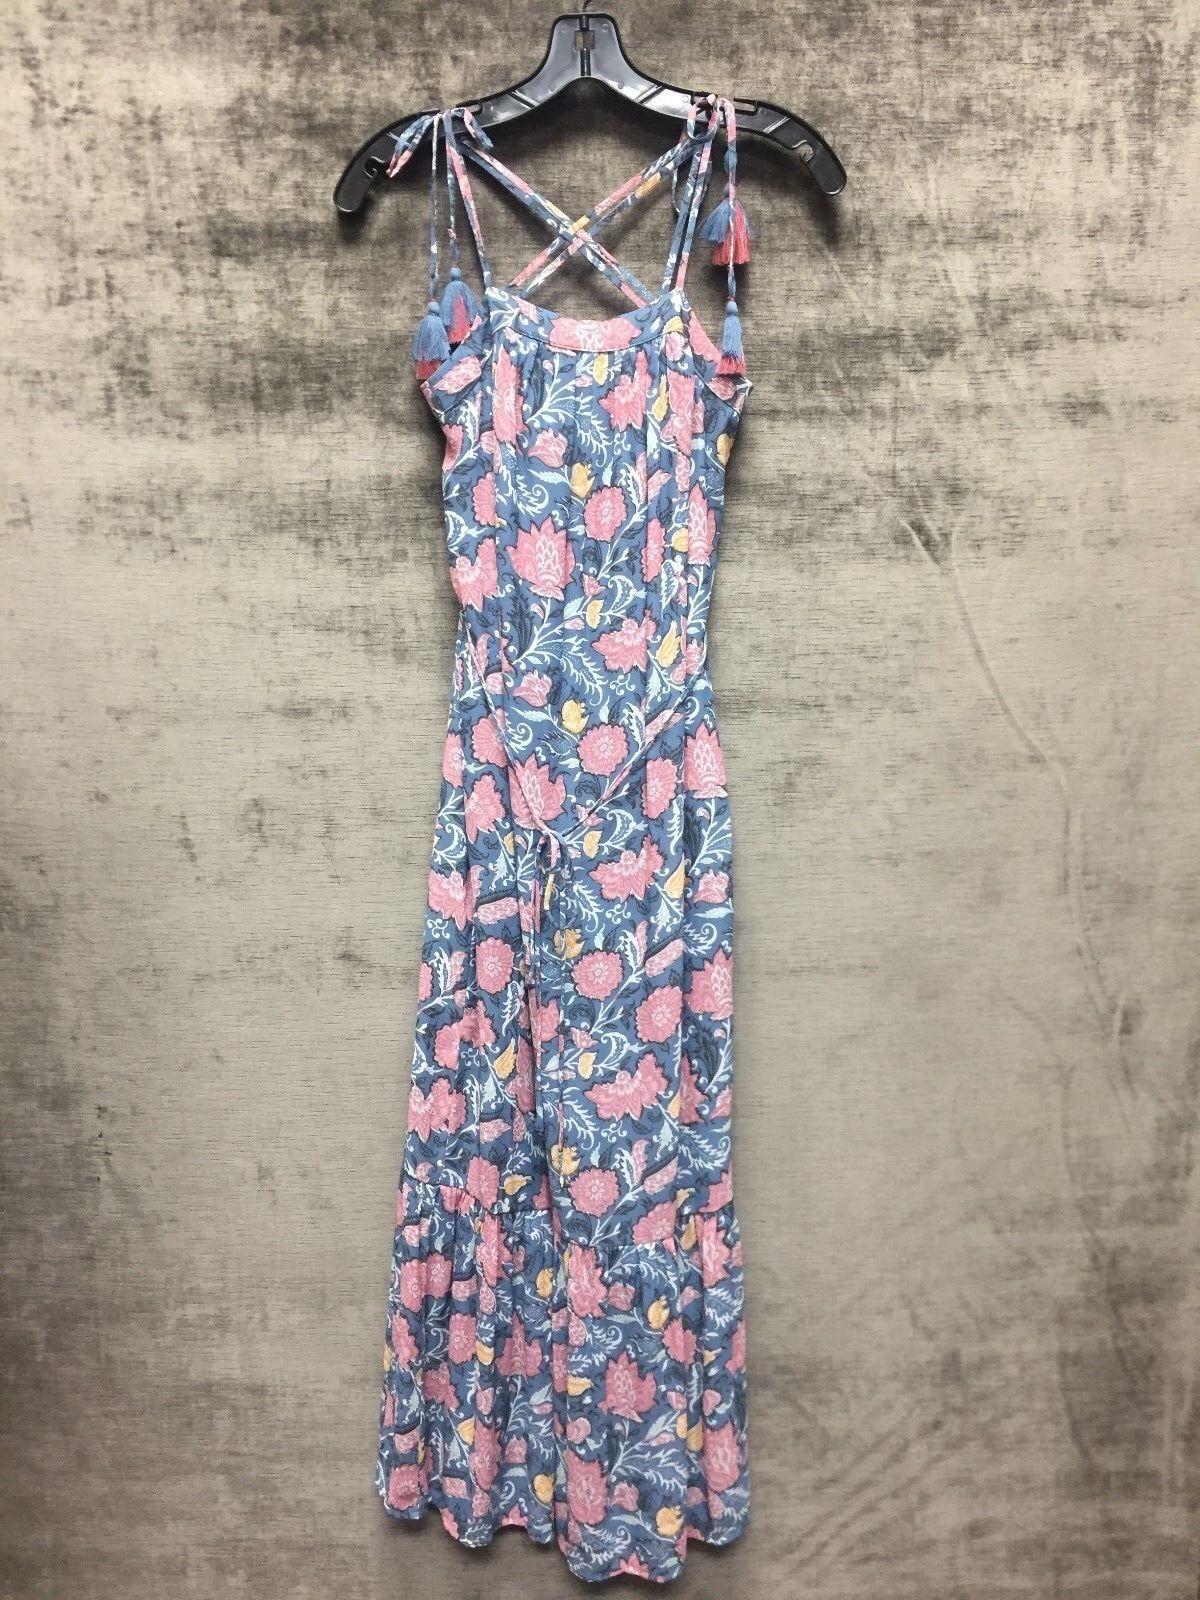 ANN TAYLOR LOFT Floral Maxi Dress Size XXS Petite BNWT  37.50